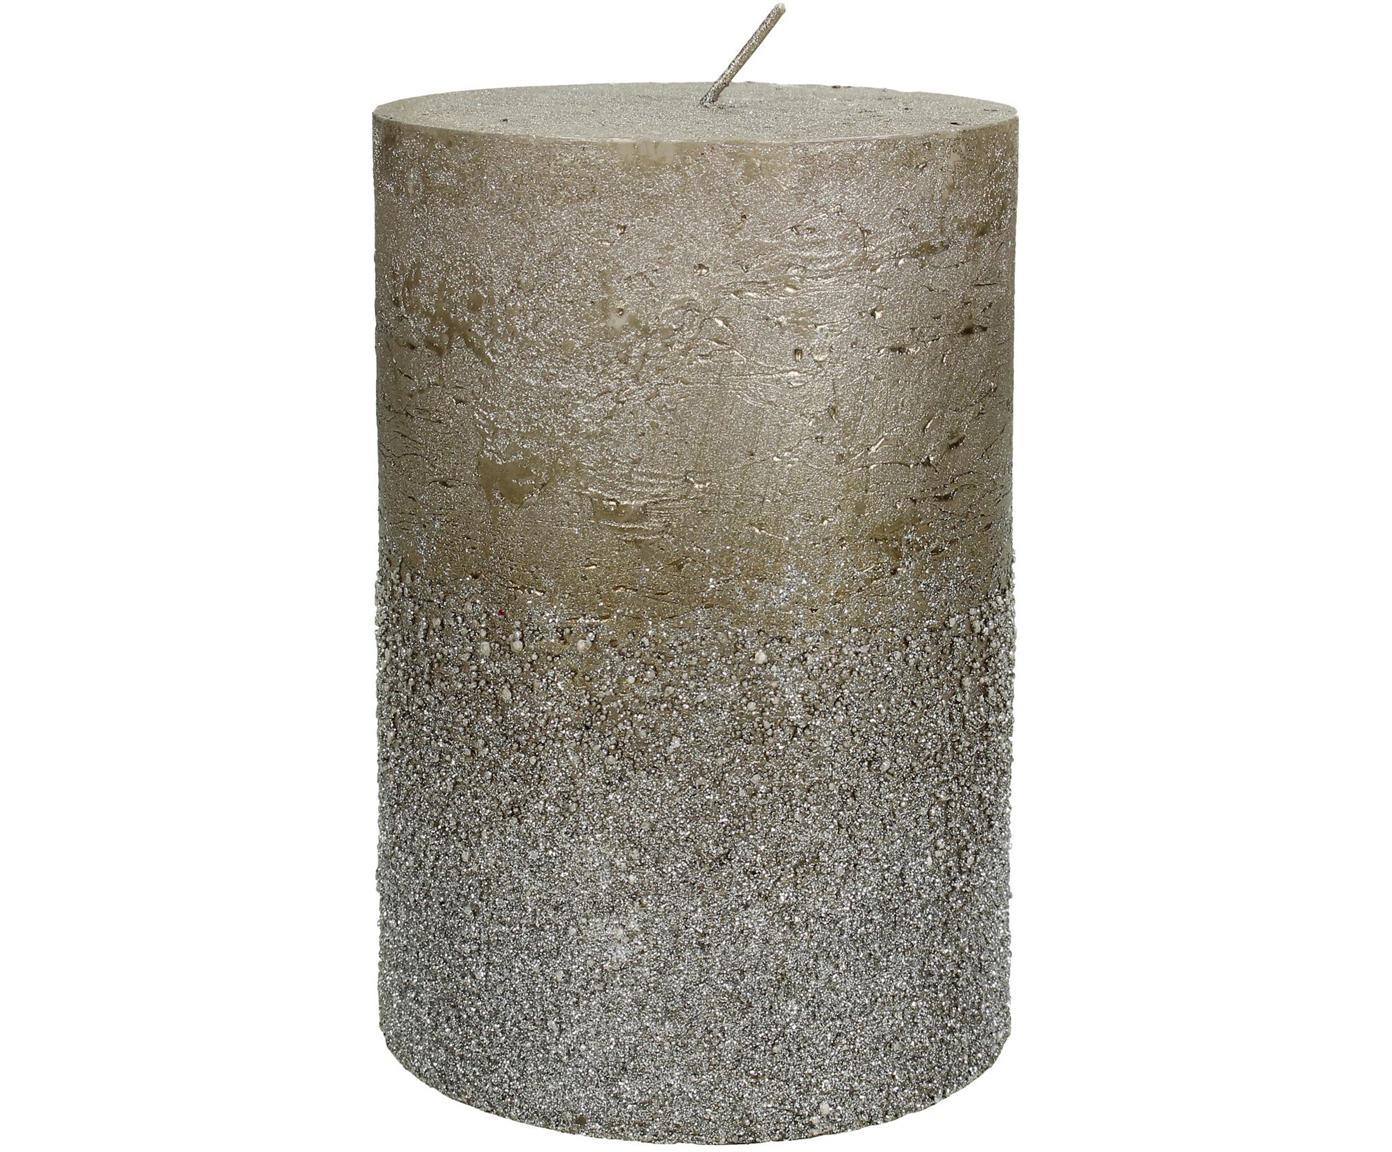 Candela pilastro Glitters, Cera, Grigio, Ø 10 x Alt. 15 cm